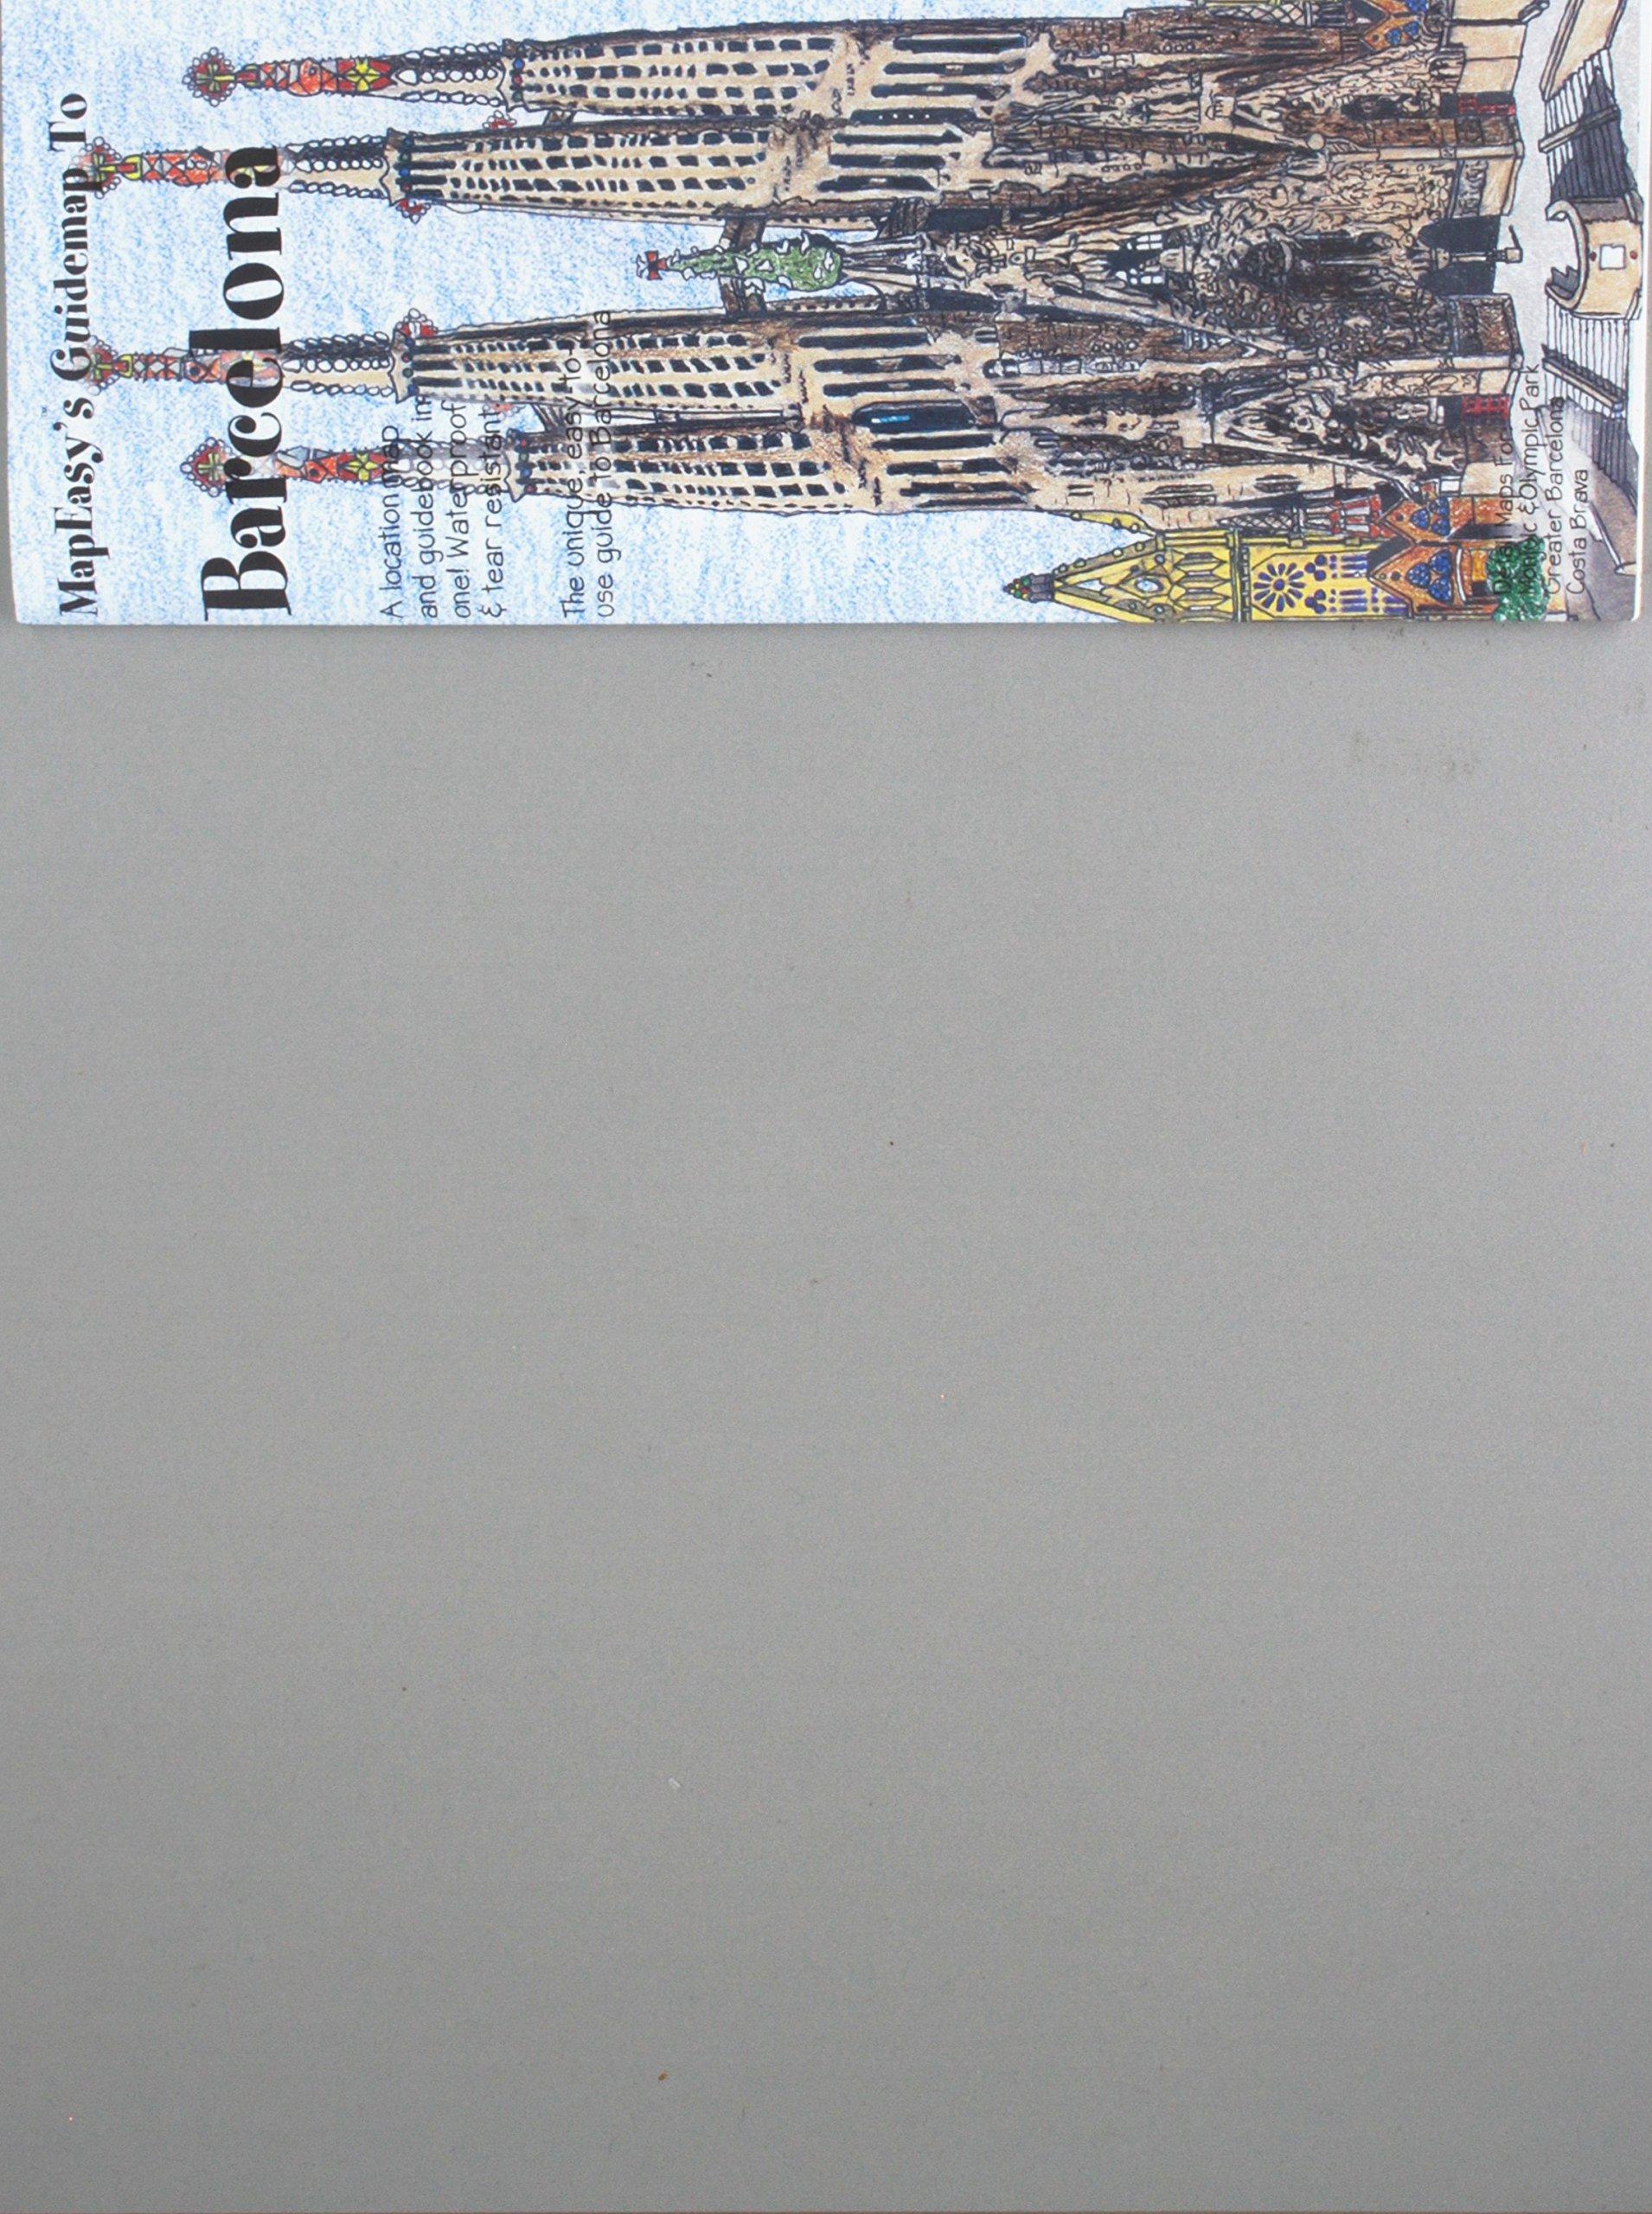 Amazon.com: MapEasys Guidemap to Barcelona (9781929038213 ...